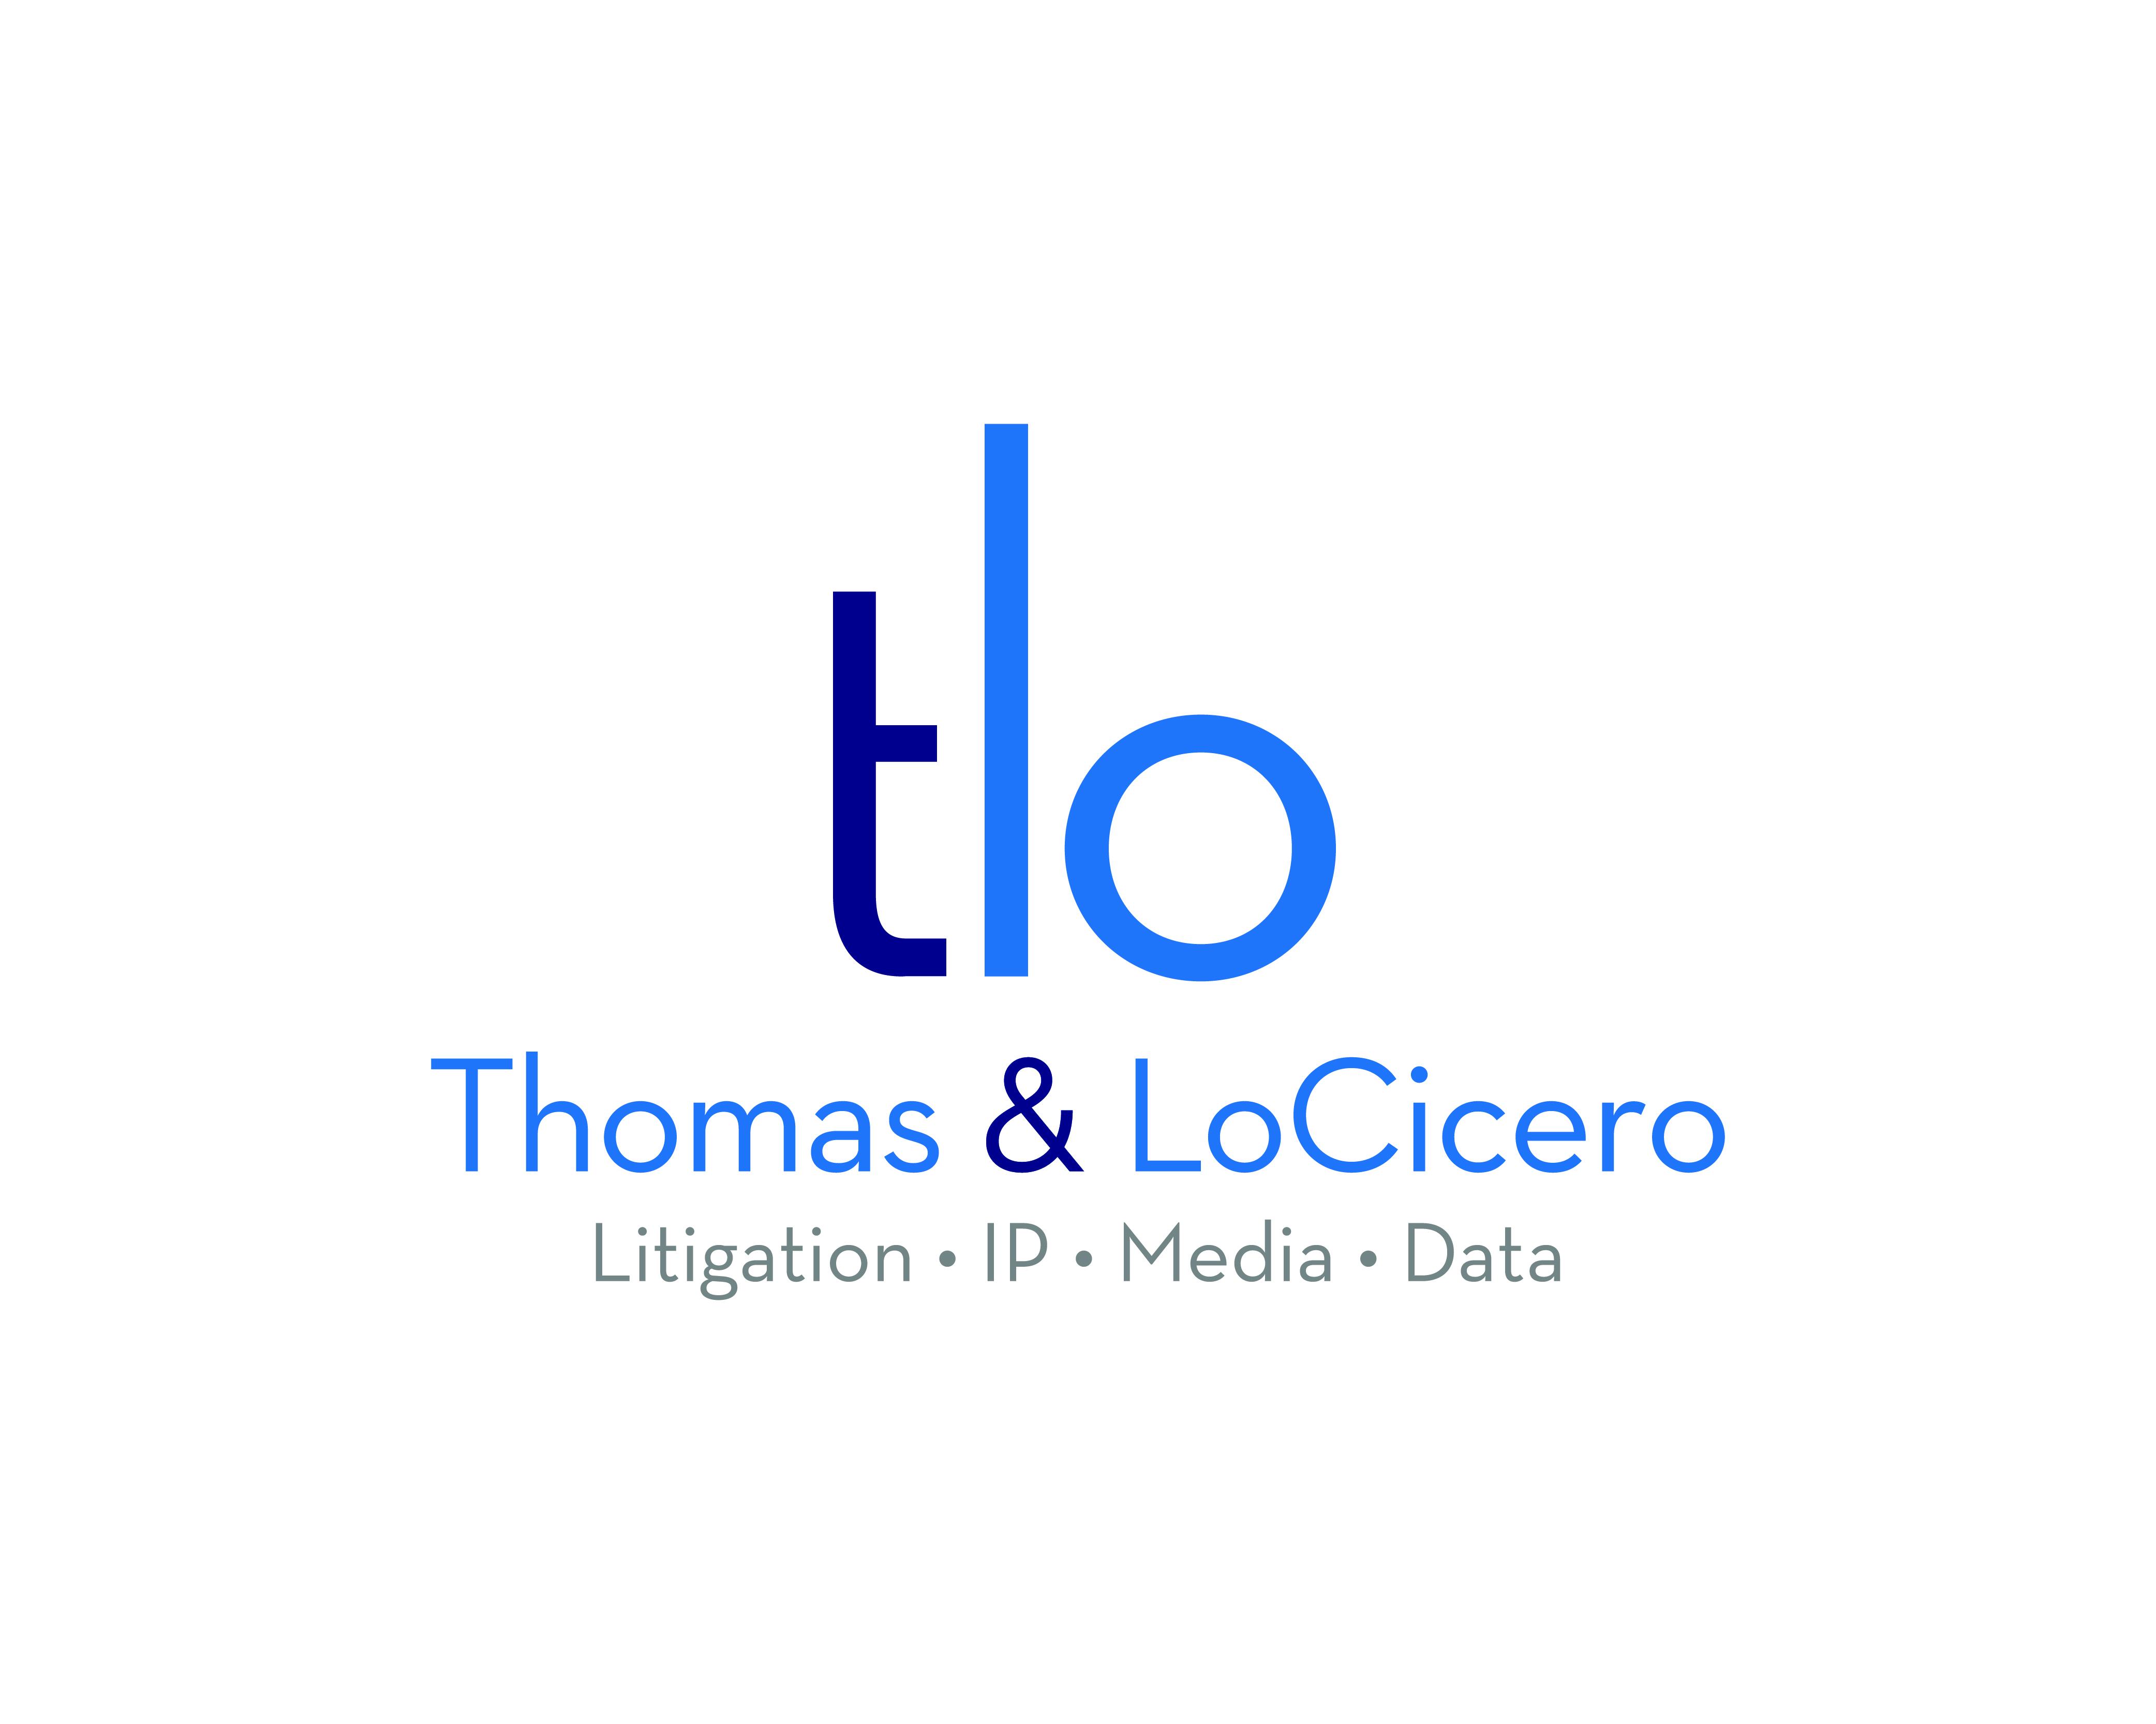 Thoma-LoCicero